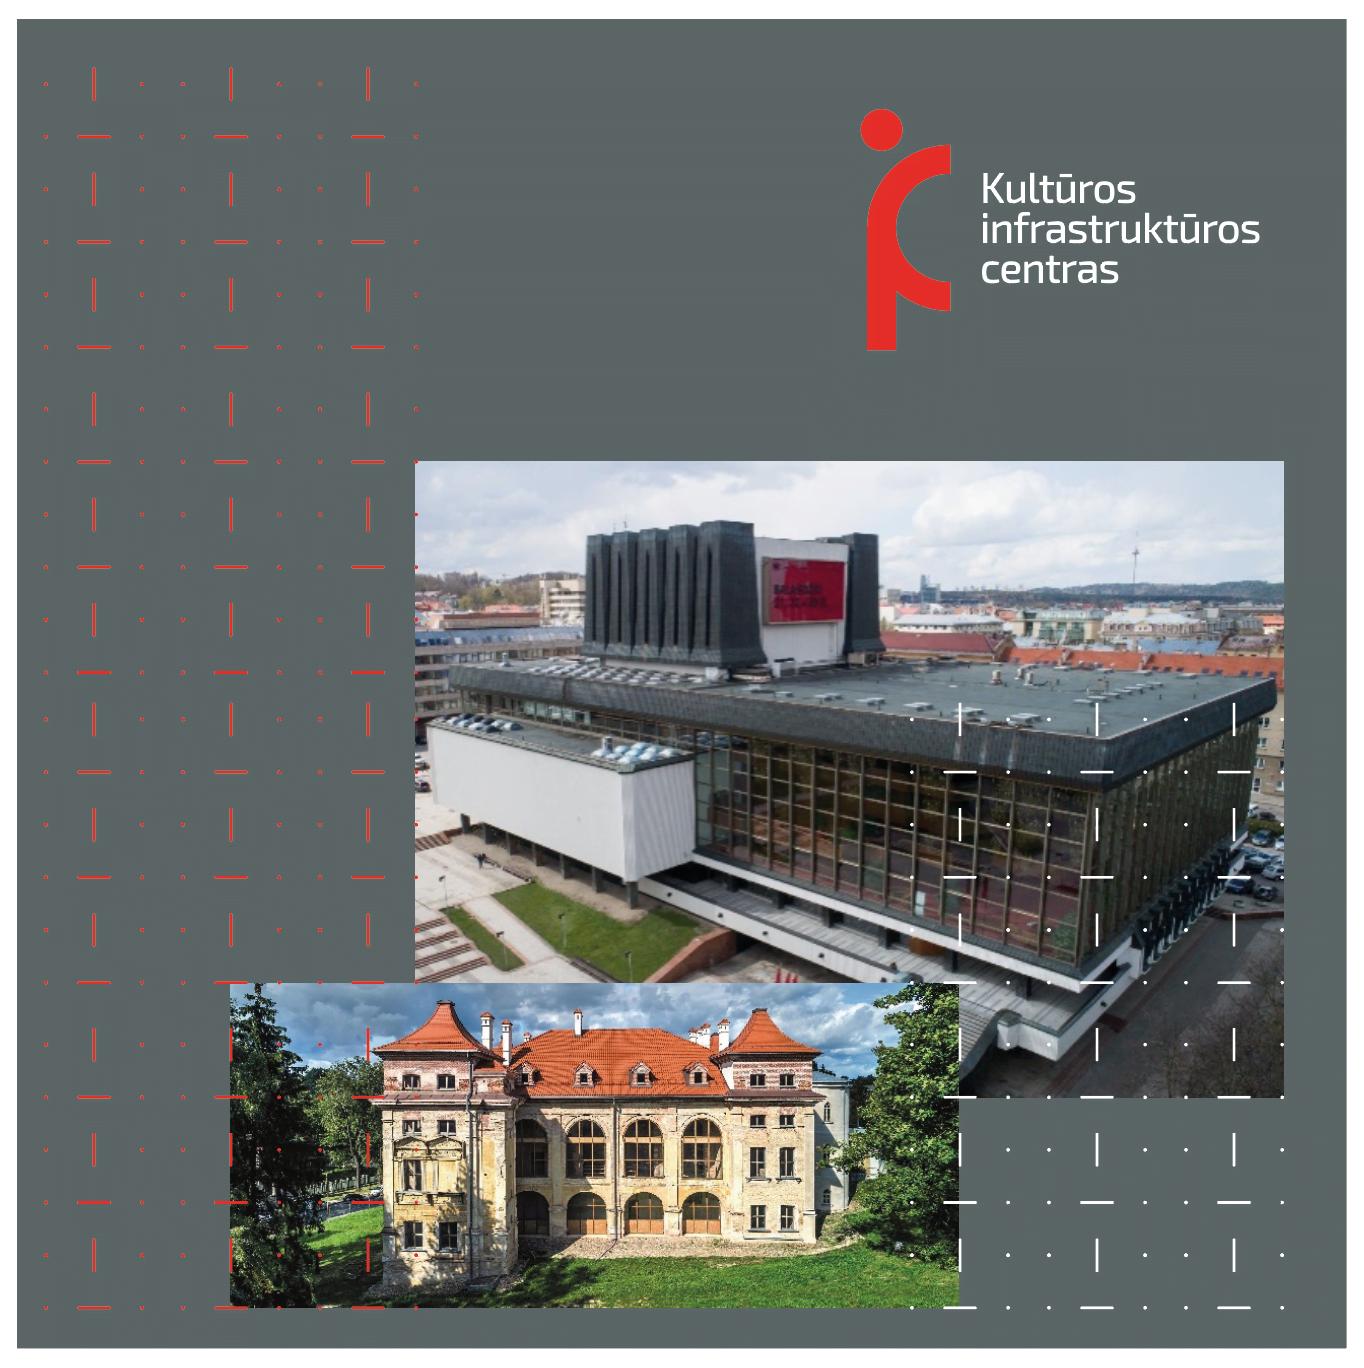 Kultūros infrastruktūros centras (KIC).